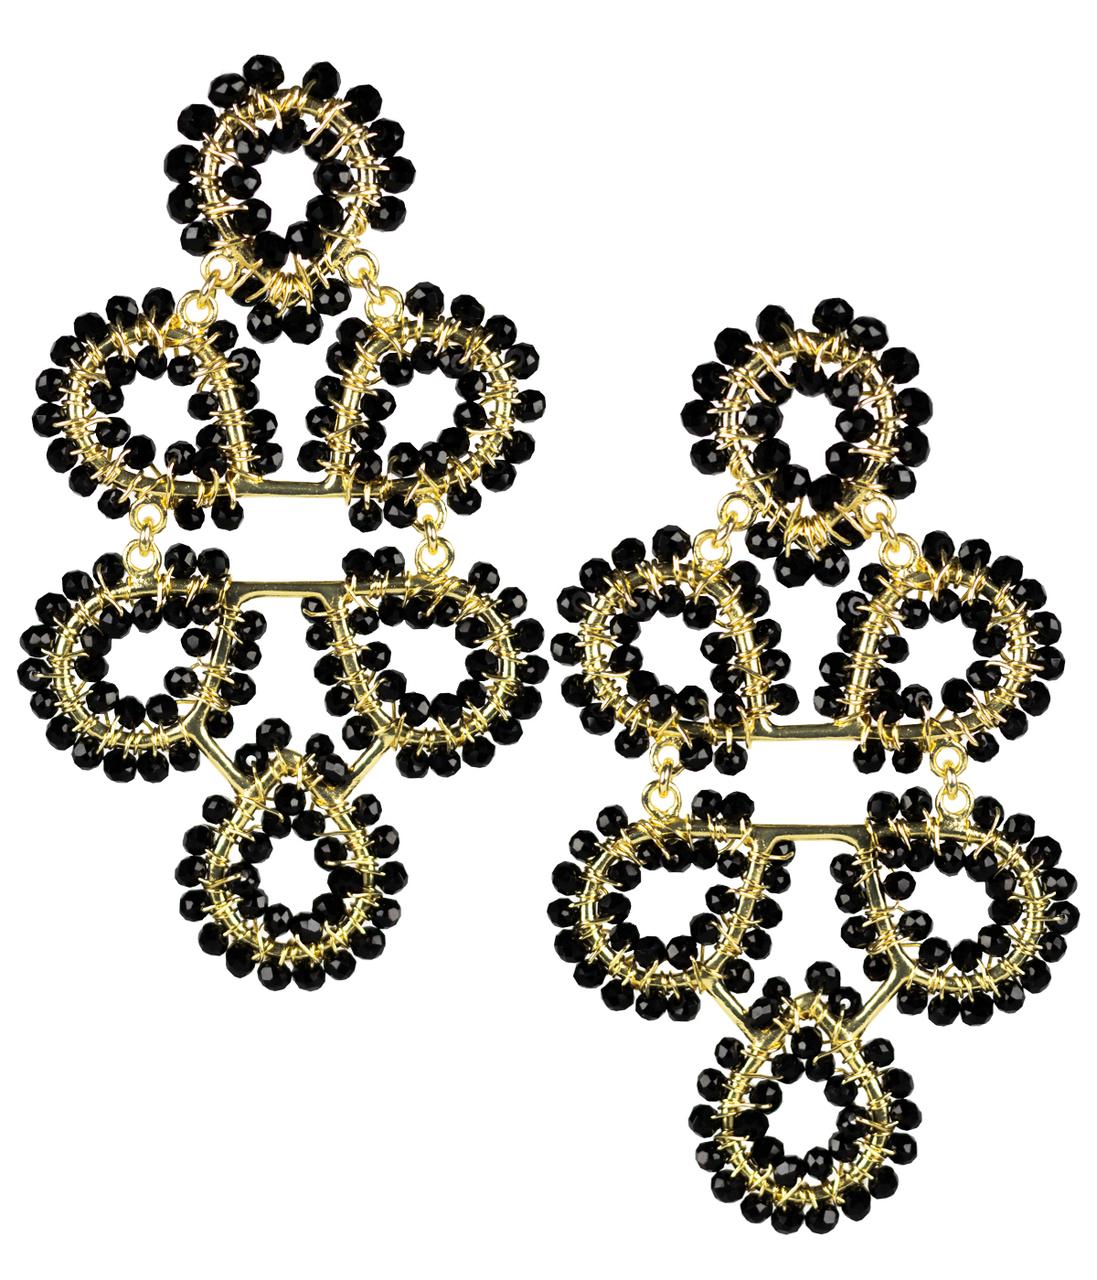 Ginger Black Earrings by LISI LERCH